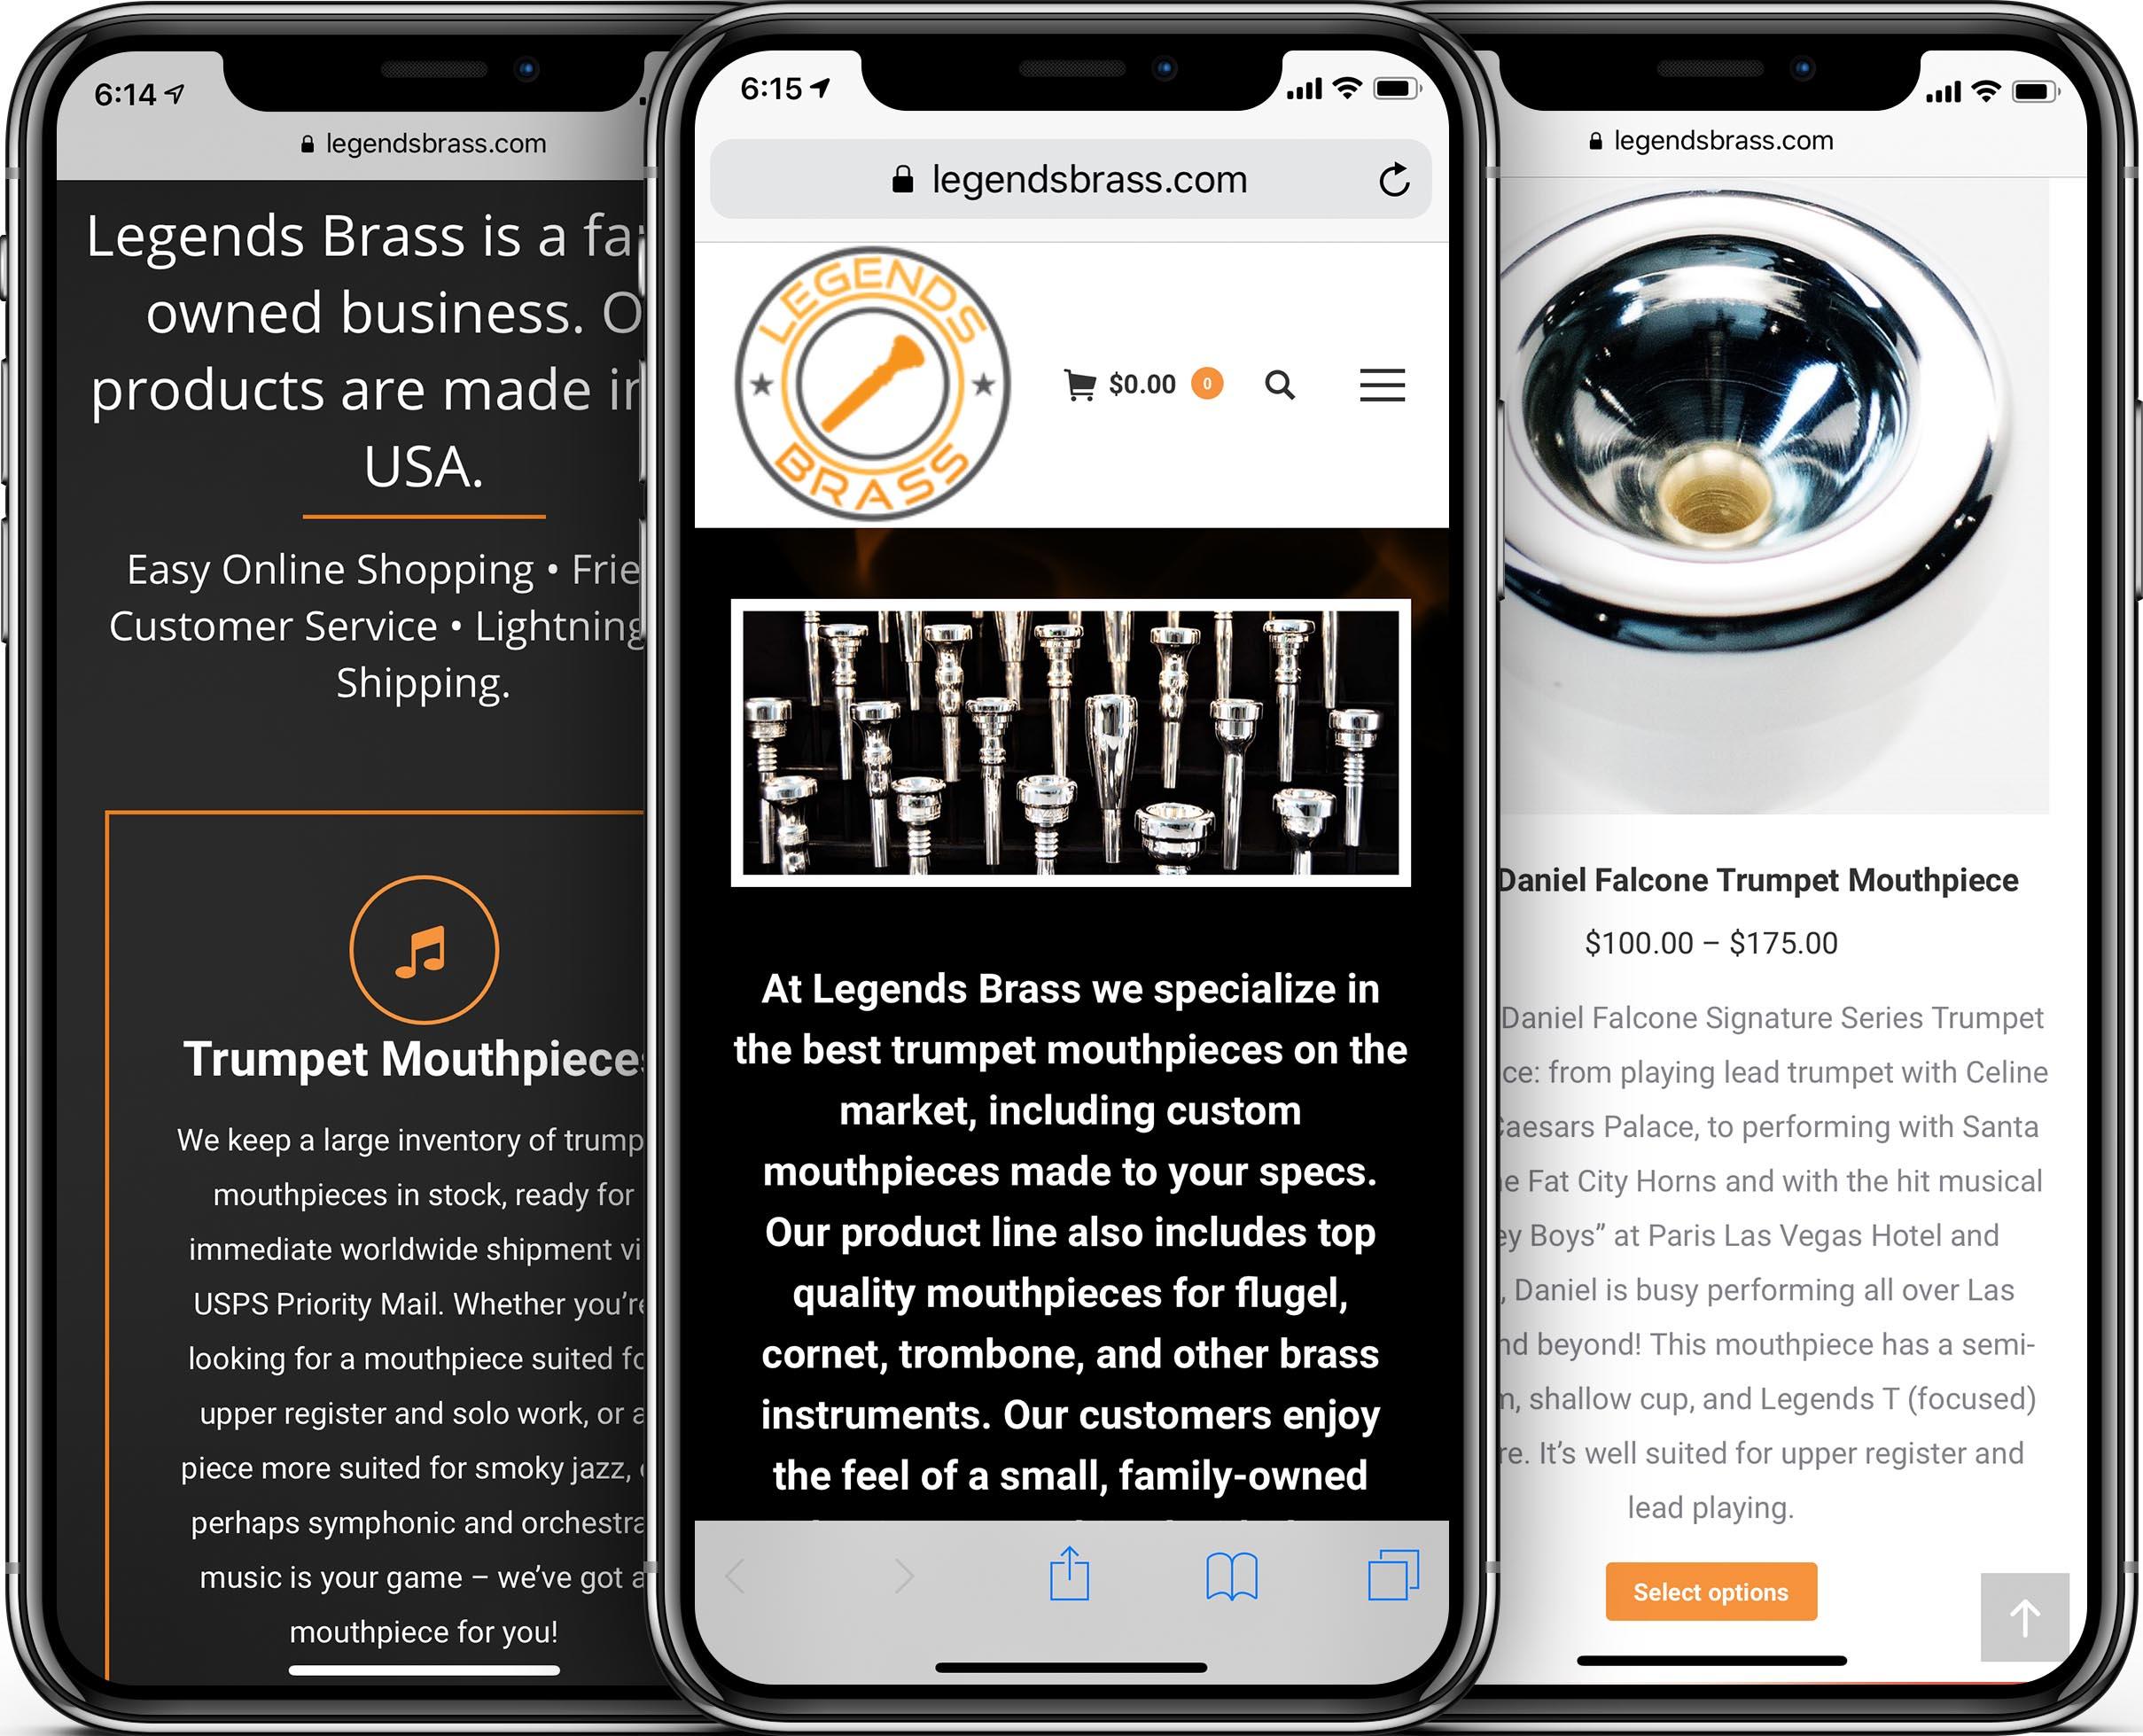 Legends Brass Mobile-Friendly Web Design